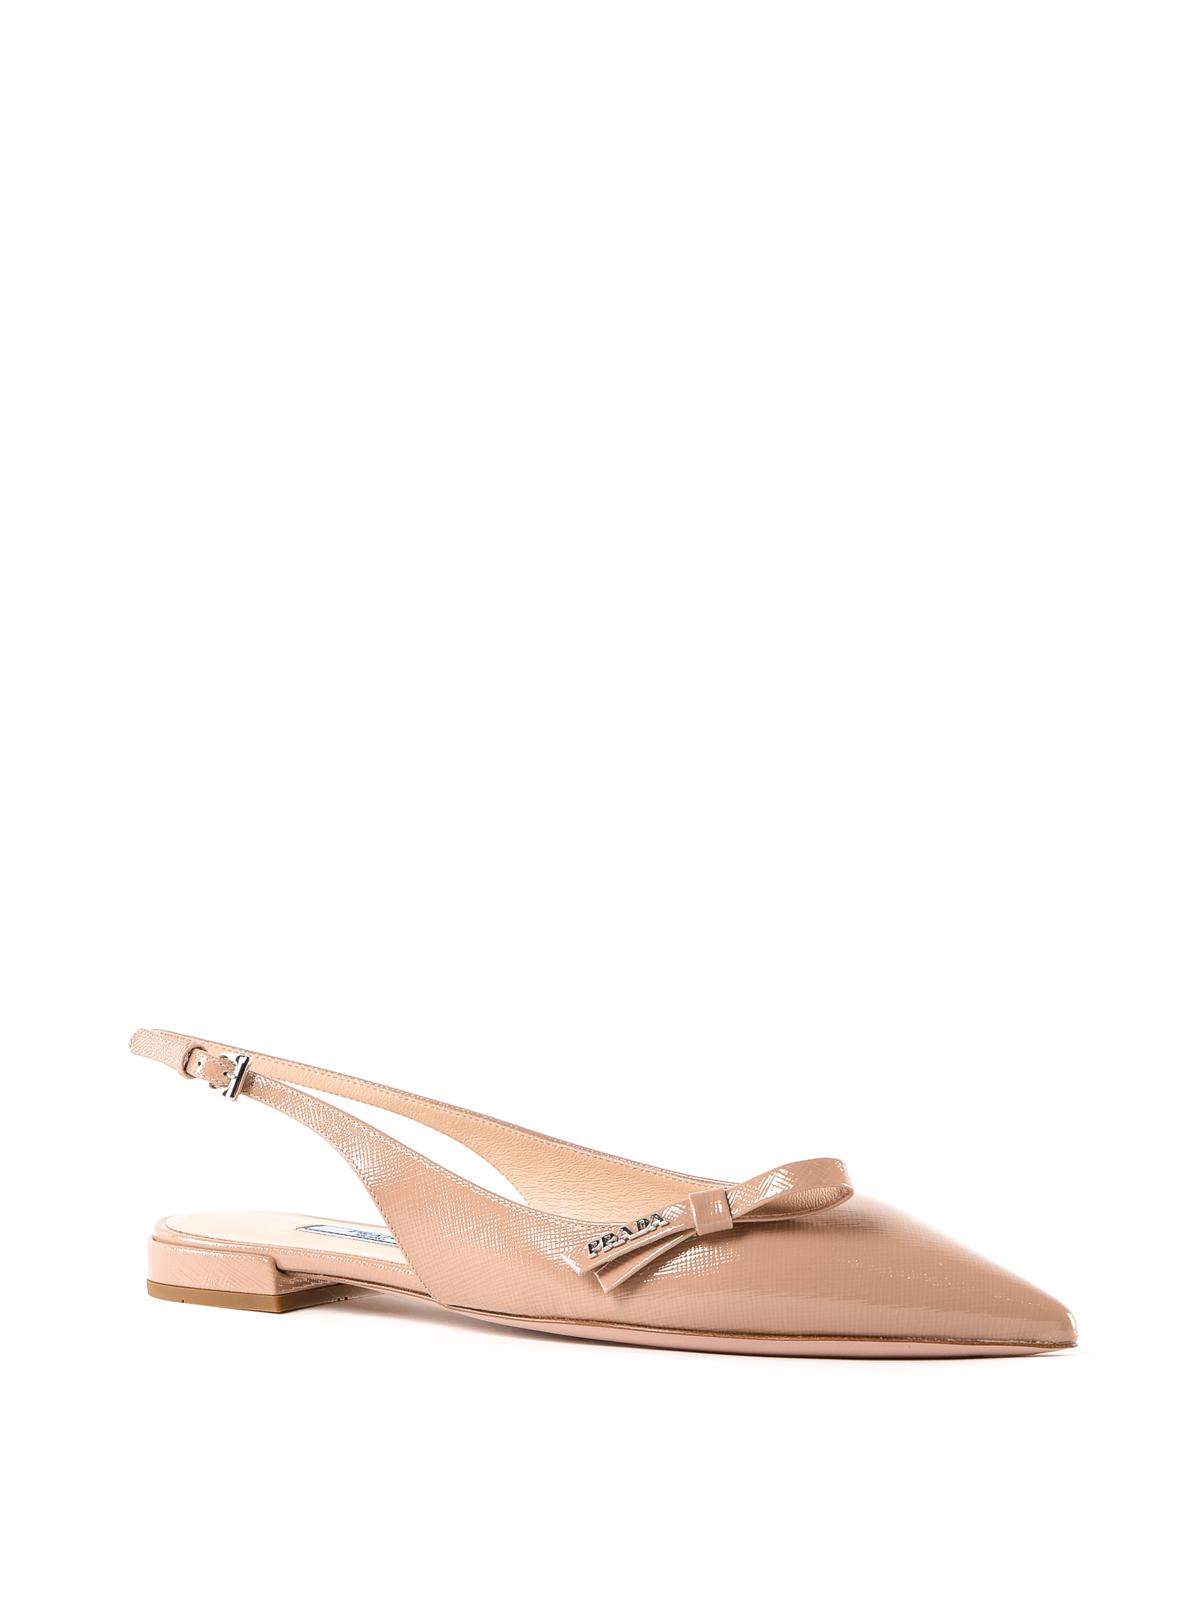 832d97ca3850 PRADA  sandals online - Pink patent leather slingback flat sandals